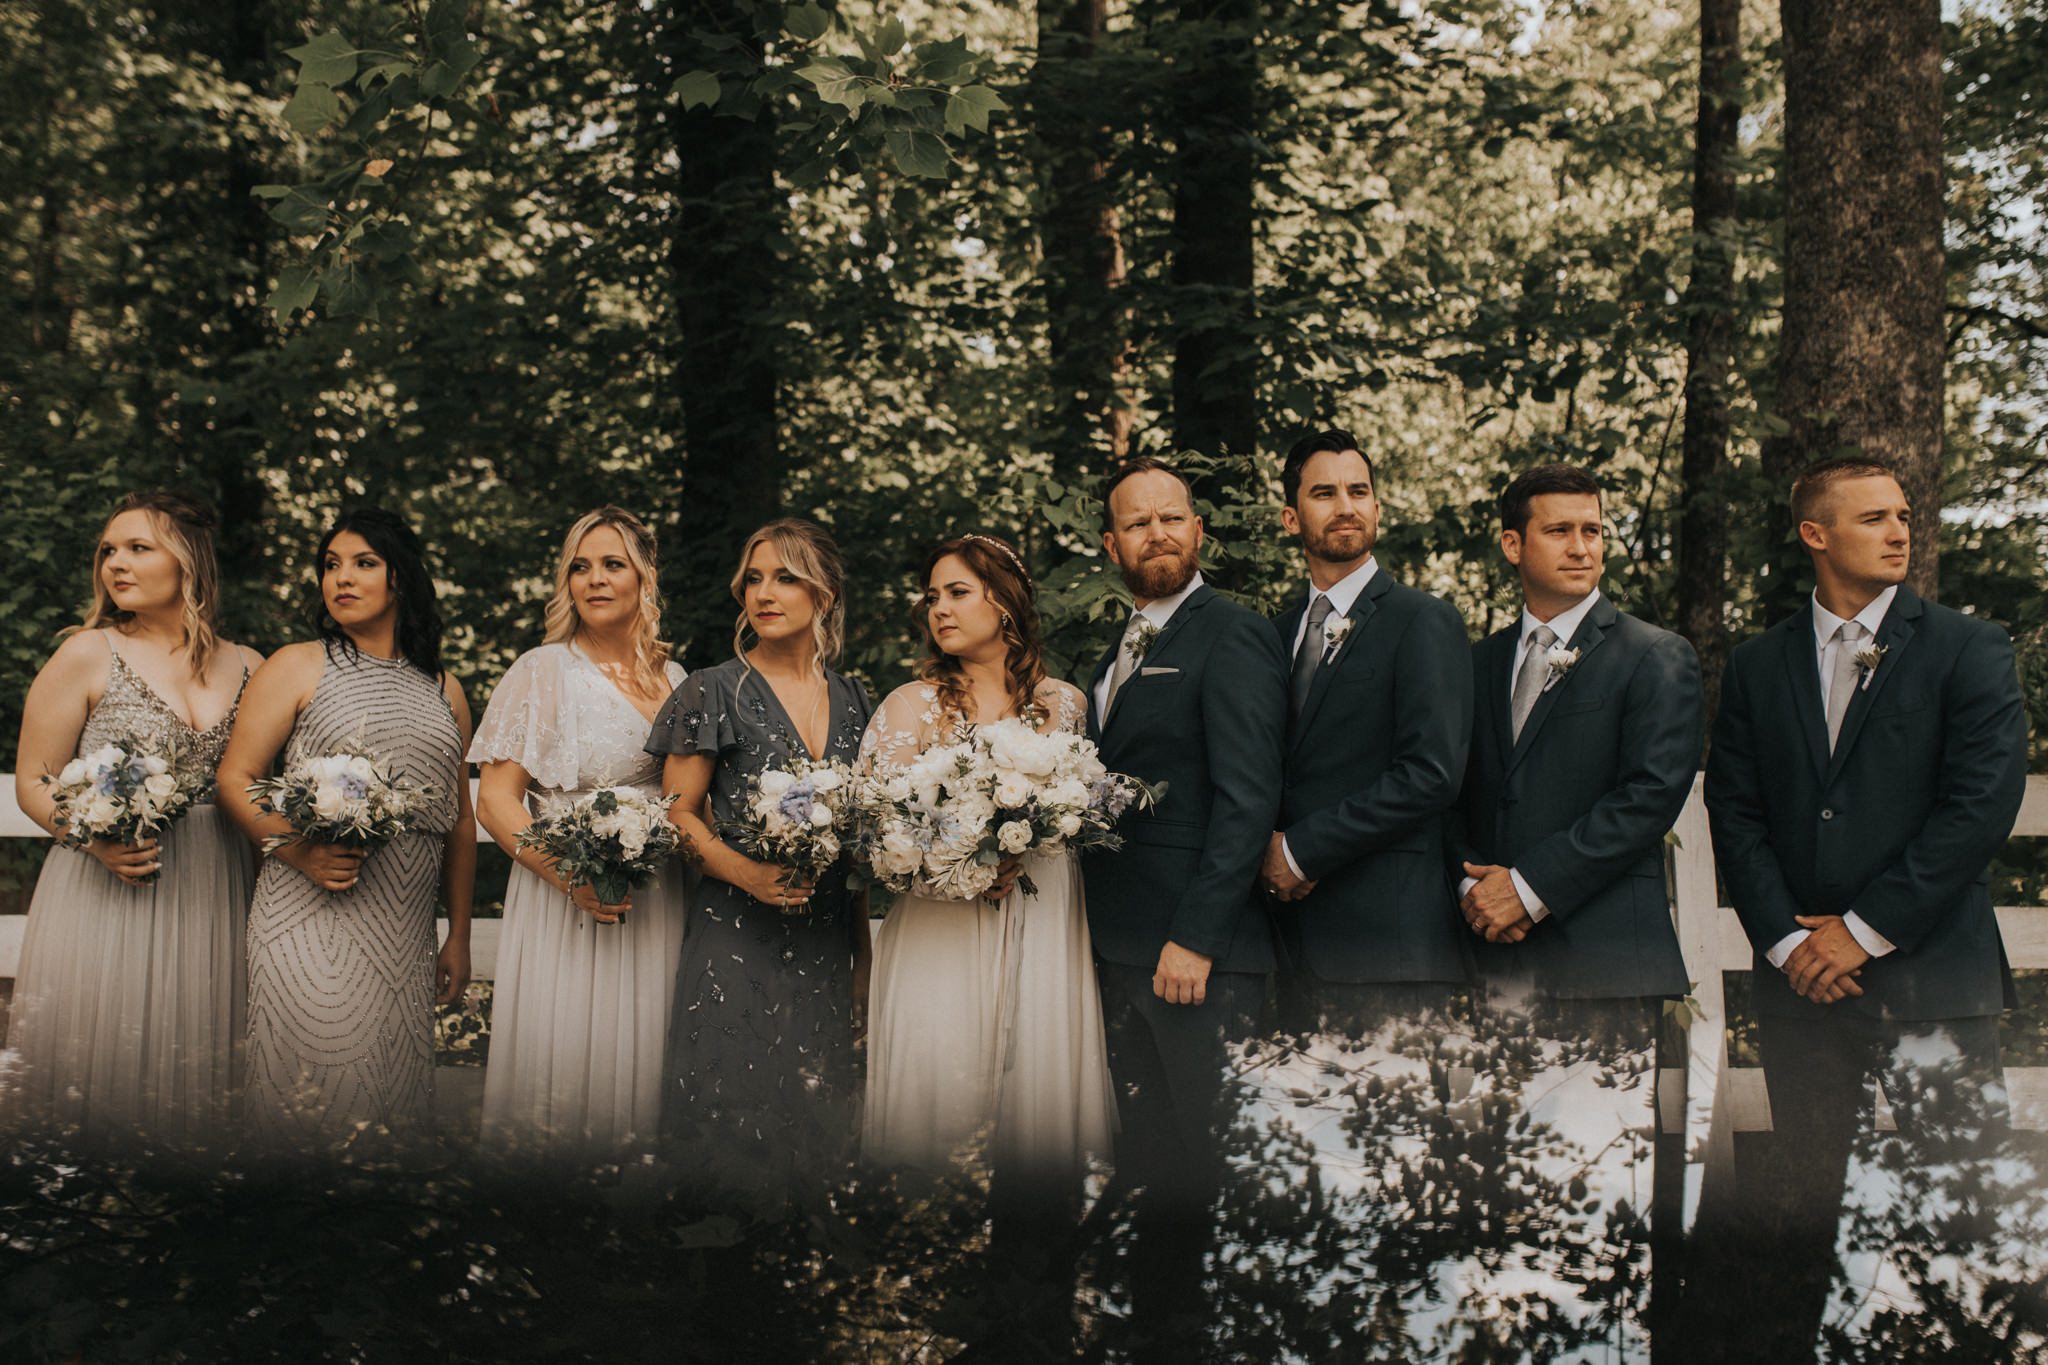 KateMatt-North-Georgia-Wedding-Photographer-Mountain-Laurel-Farm-55.jpg